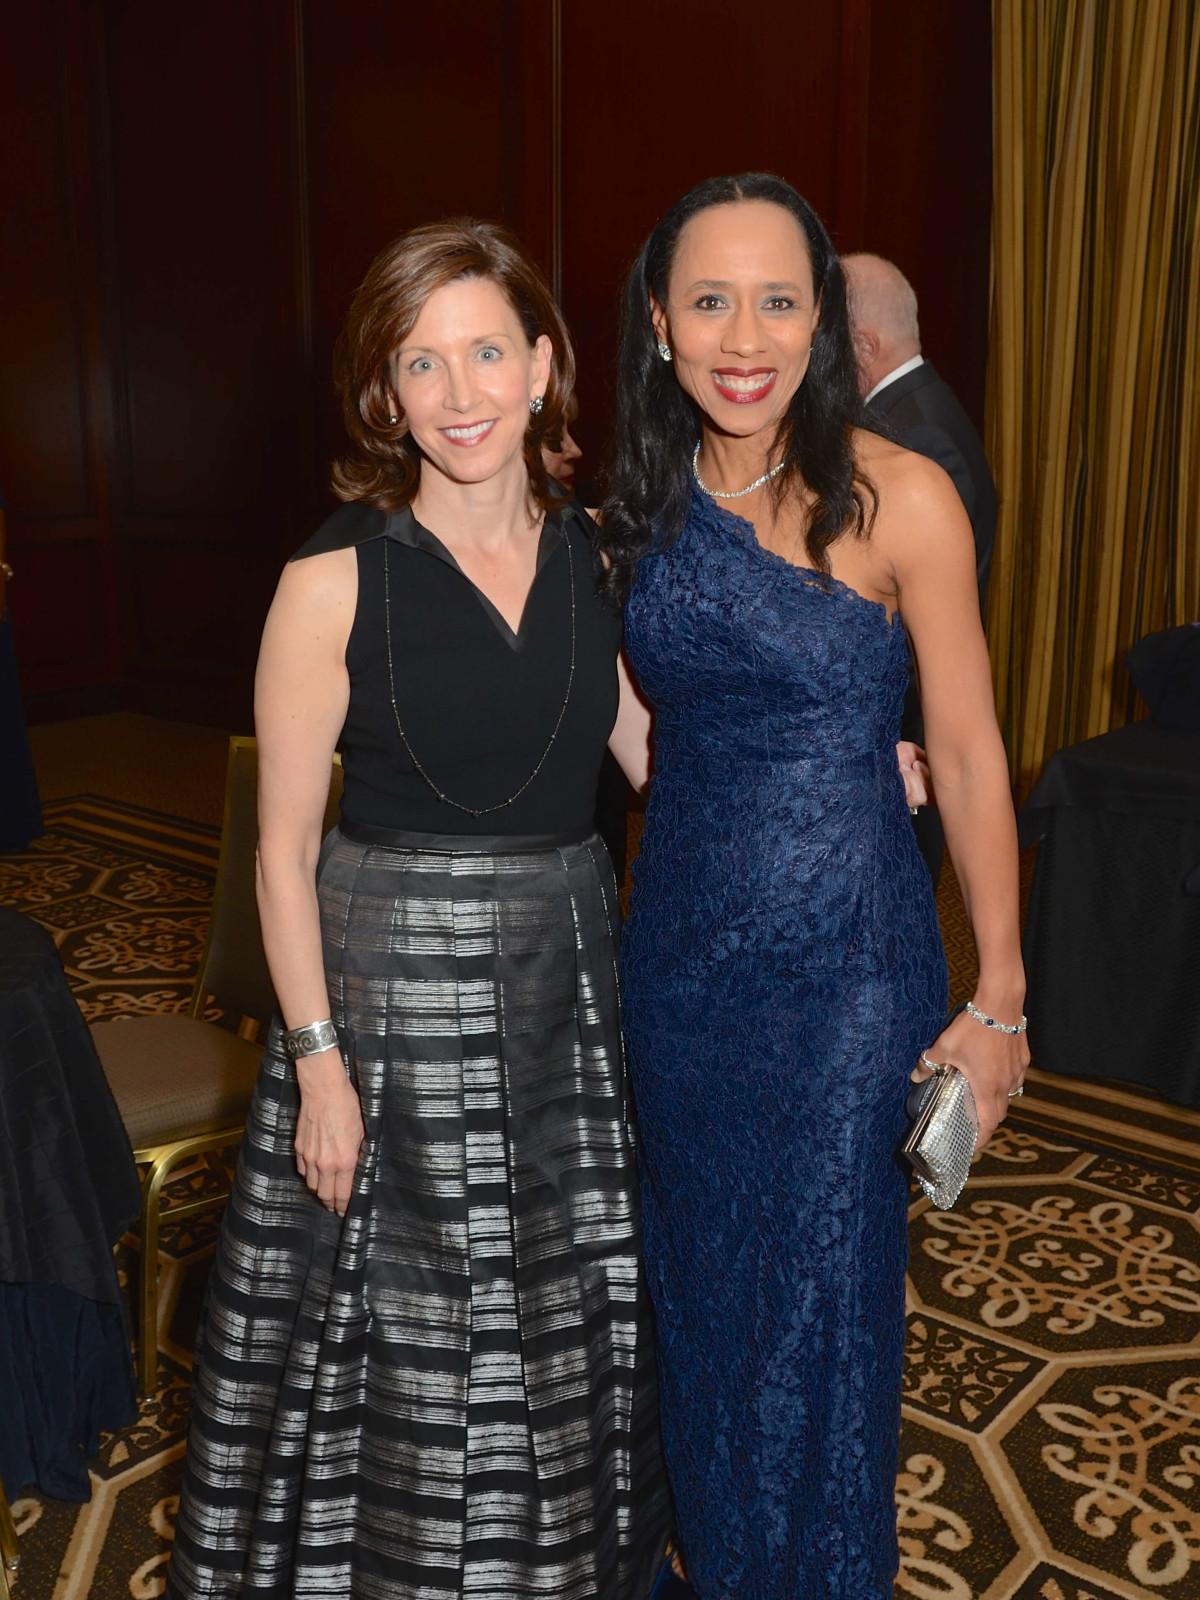 Planned Parenthood Gala, Nancy McGregor Manne, Gina Carroll